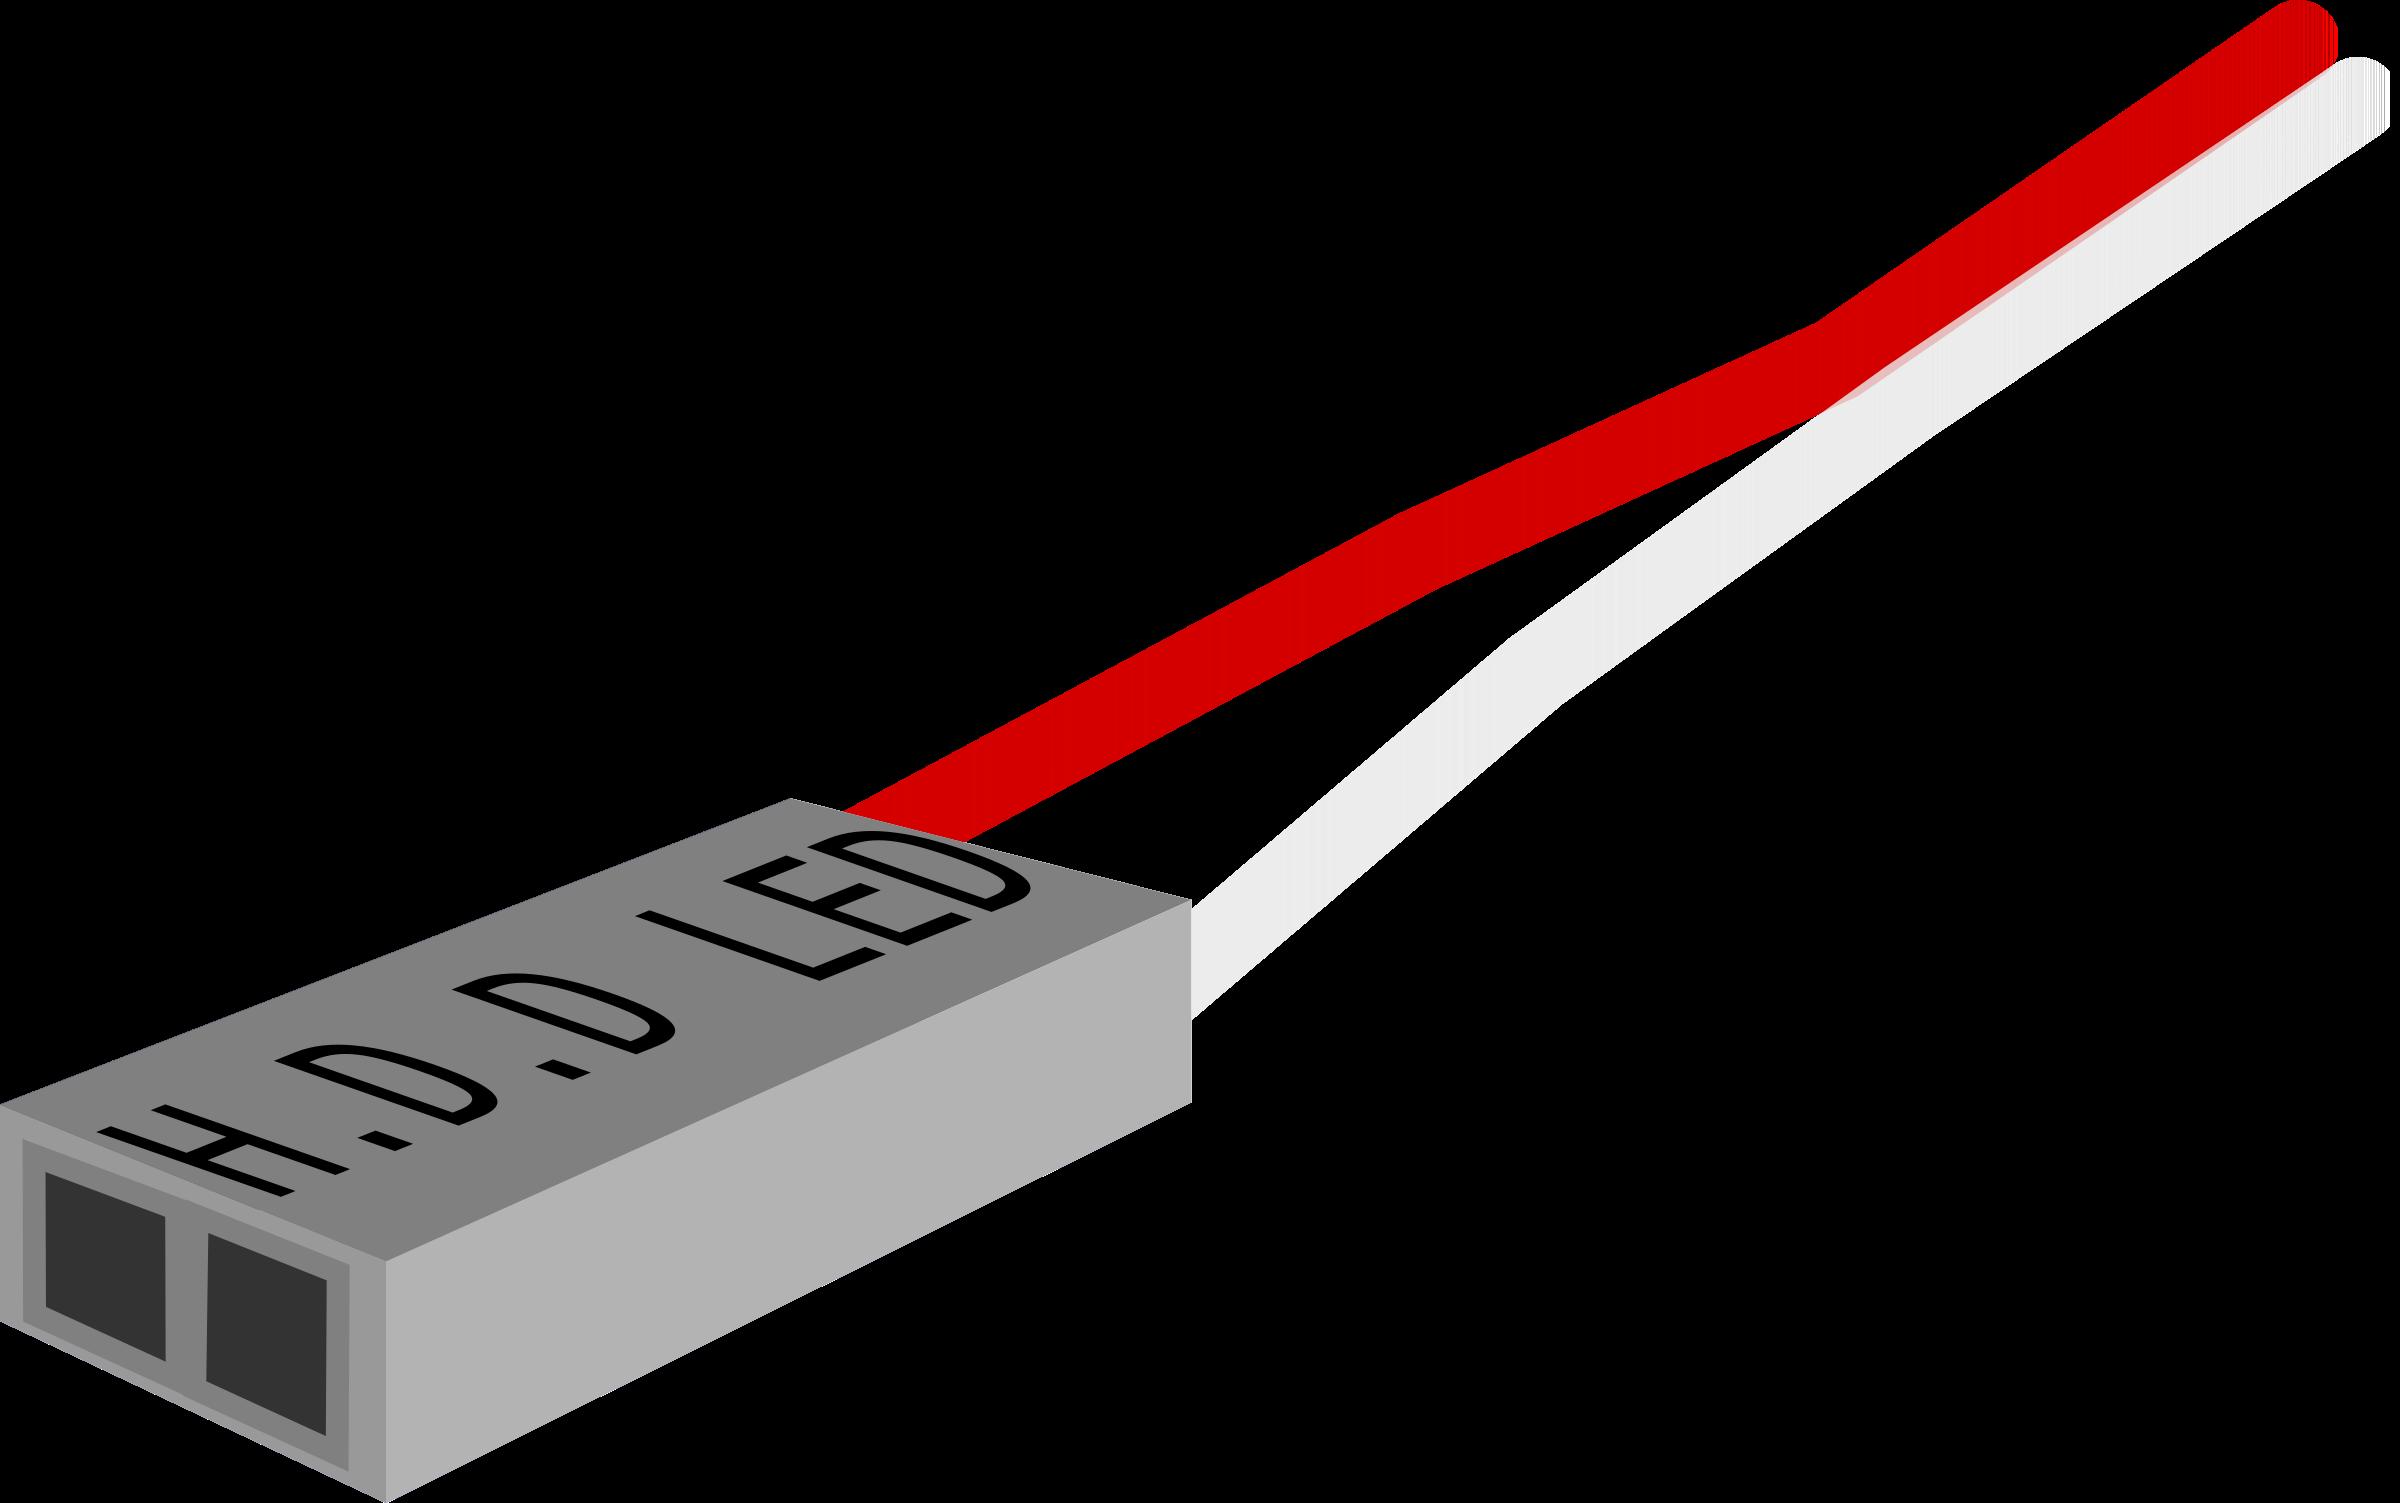 Electronics clipart network cable. H d led plug